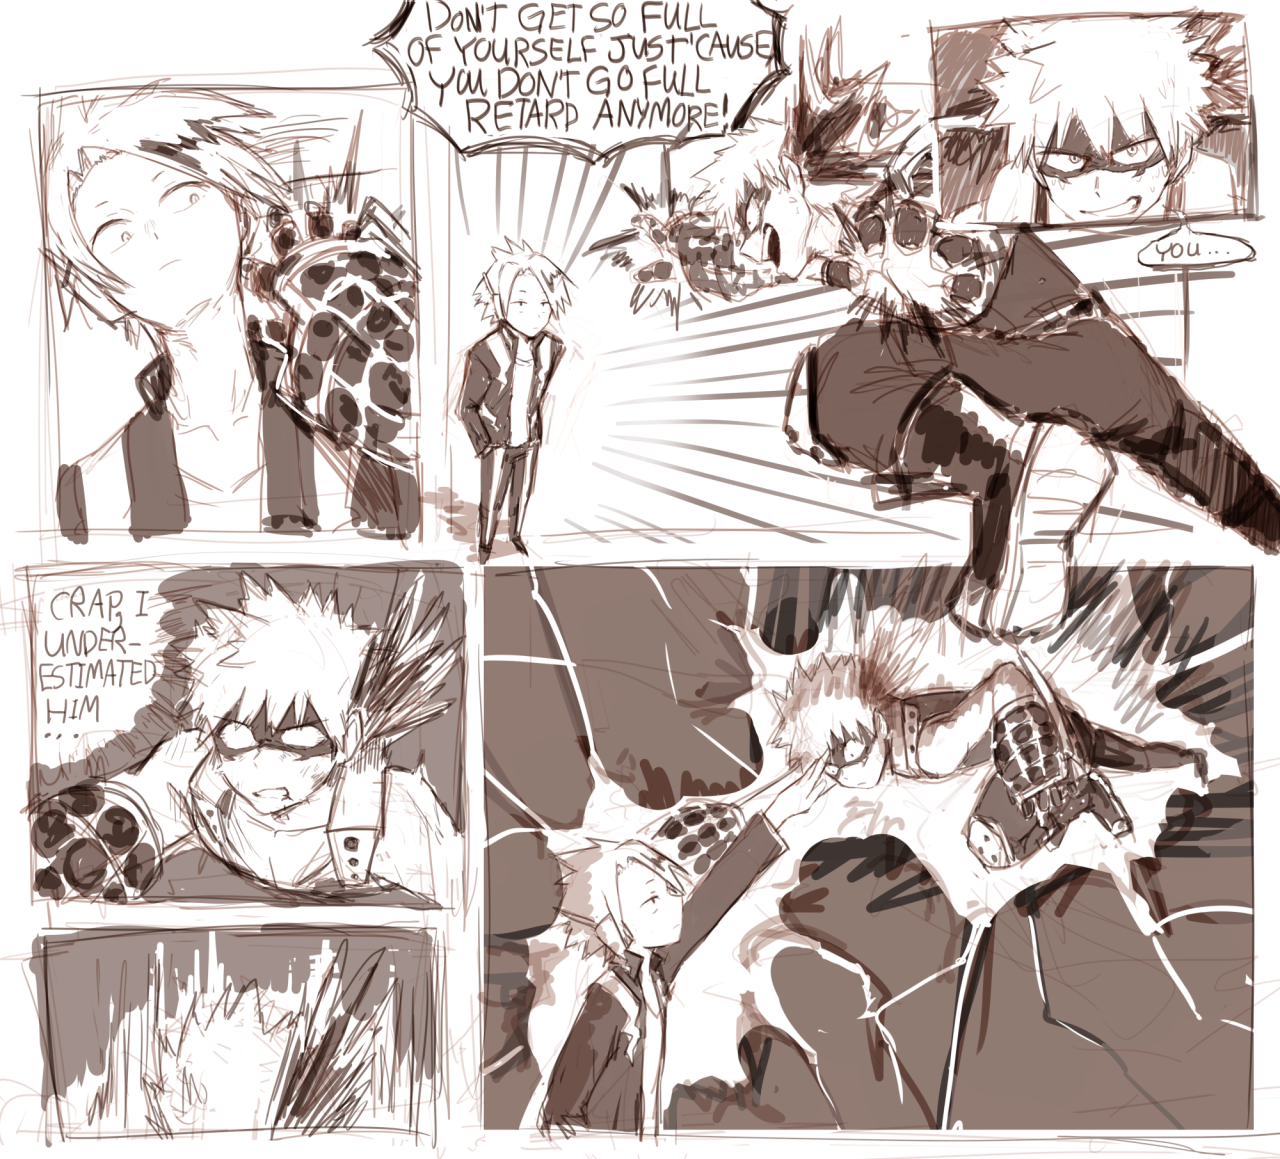 Pin By Daniela Albergaria On Boku No Hero Academia My Hero Academia Episodes My Hero My Hero Academia Manga